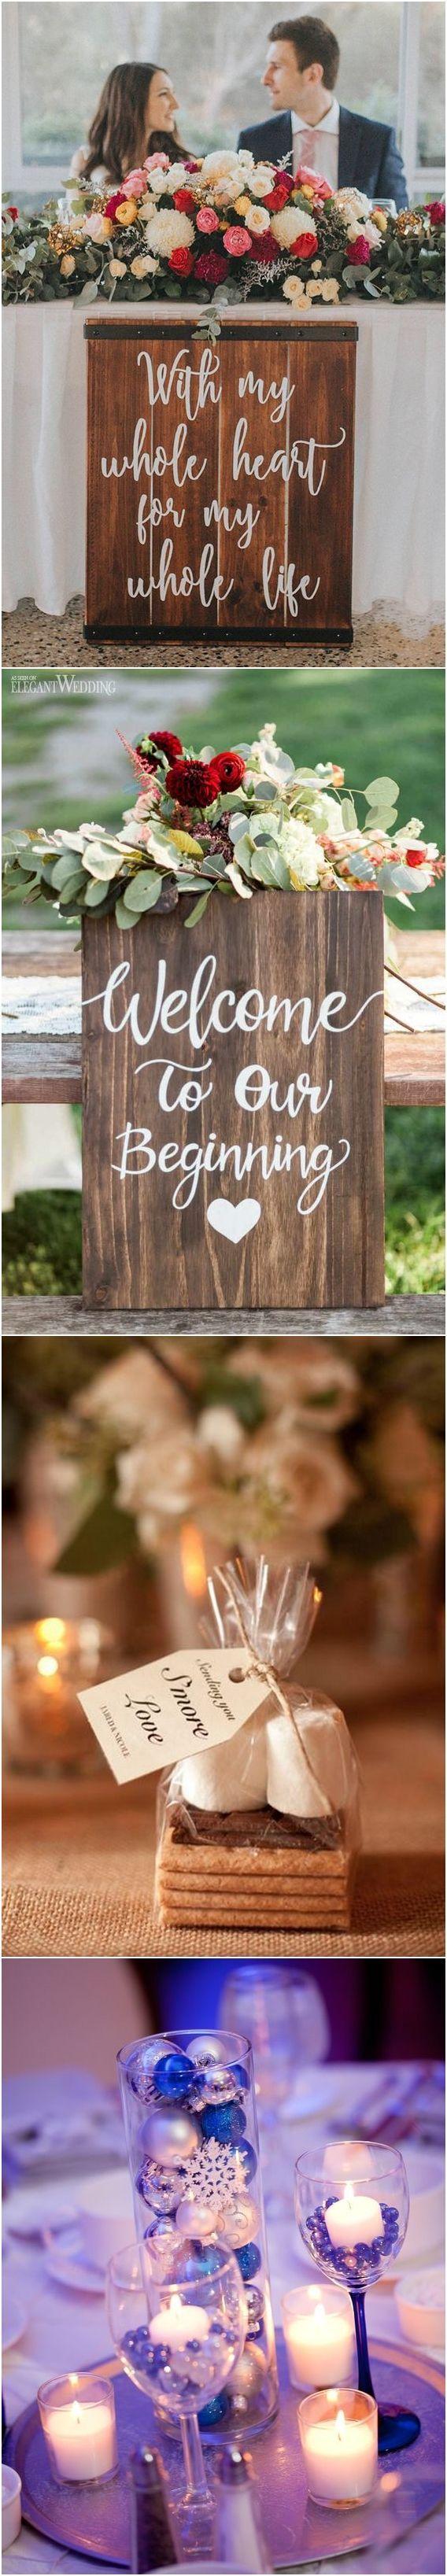 Wedding Quotes  : Winter wedding ideas  #winterwedding #winter #weddingideas www.deerpearlflow